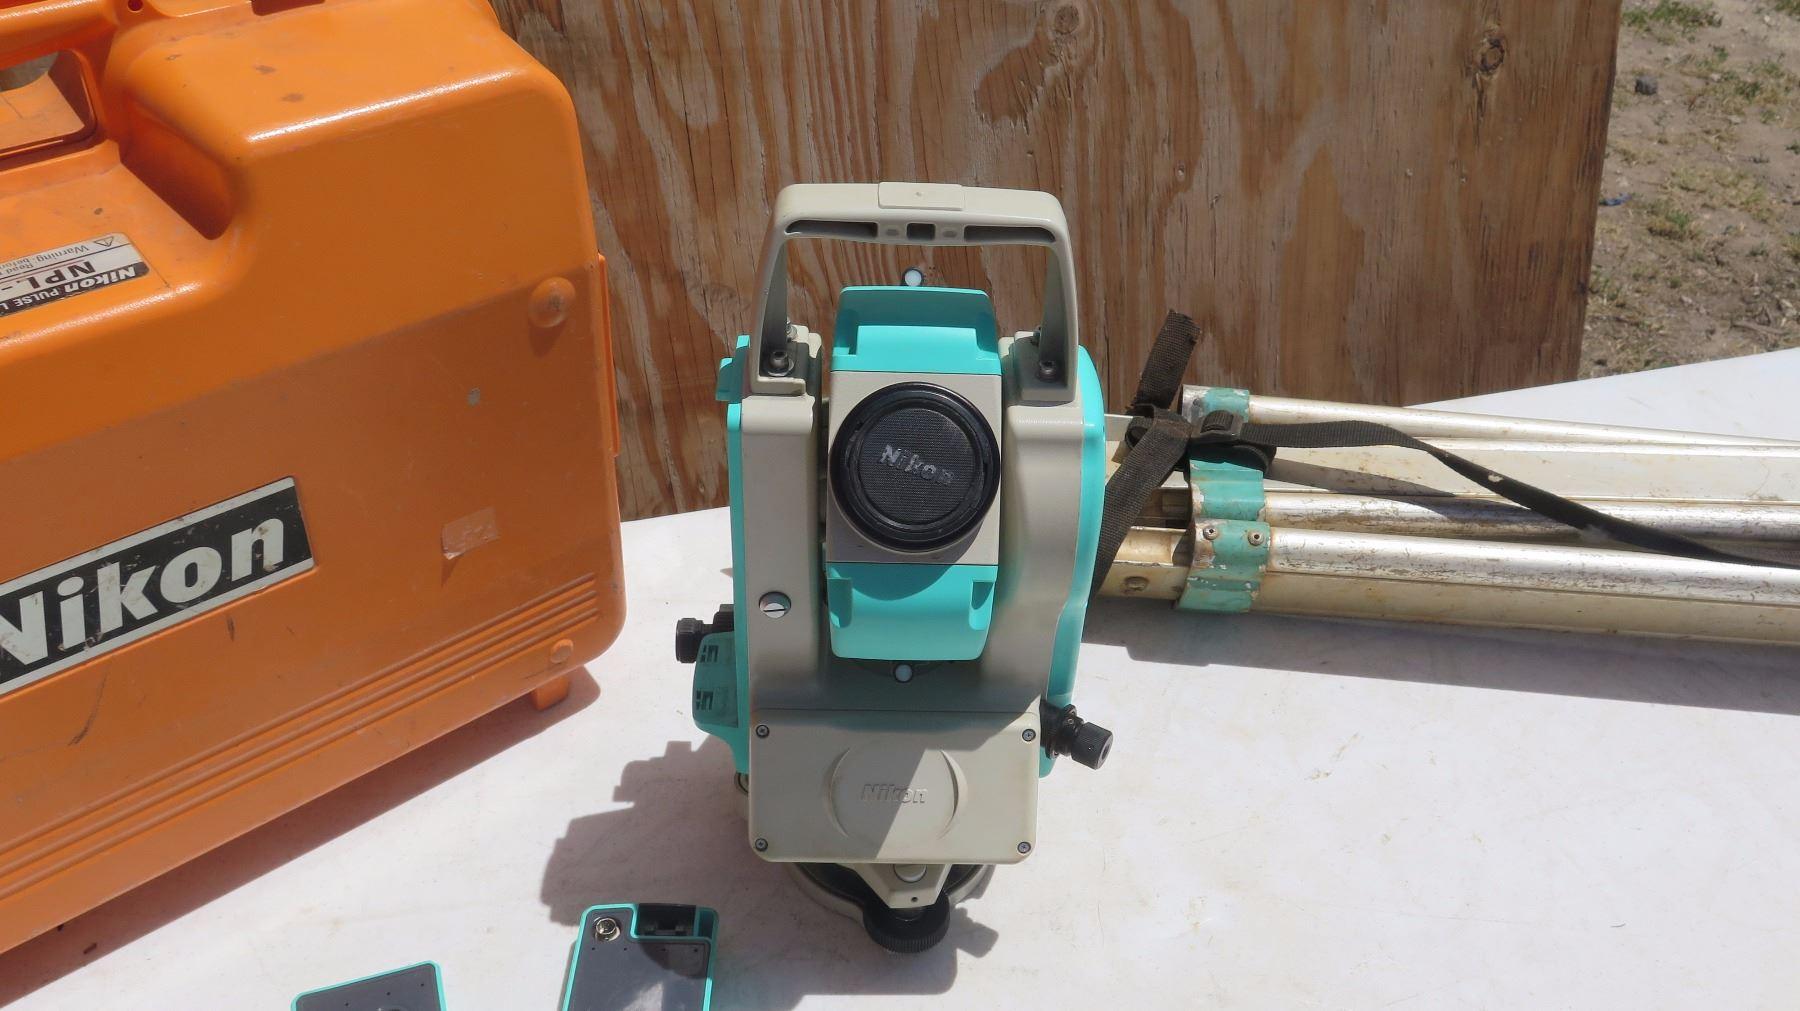 Nikon NPL-332 Surveying Total Station Transit w/Case